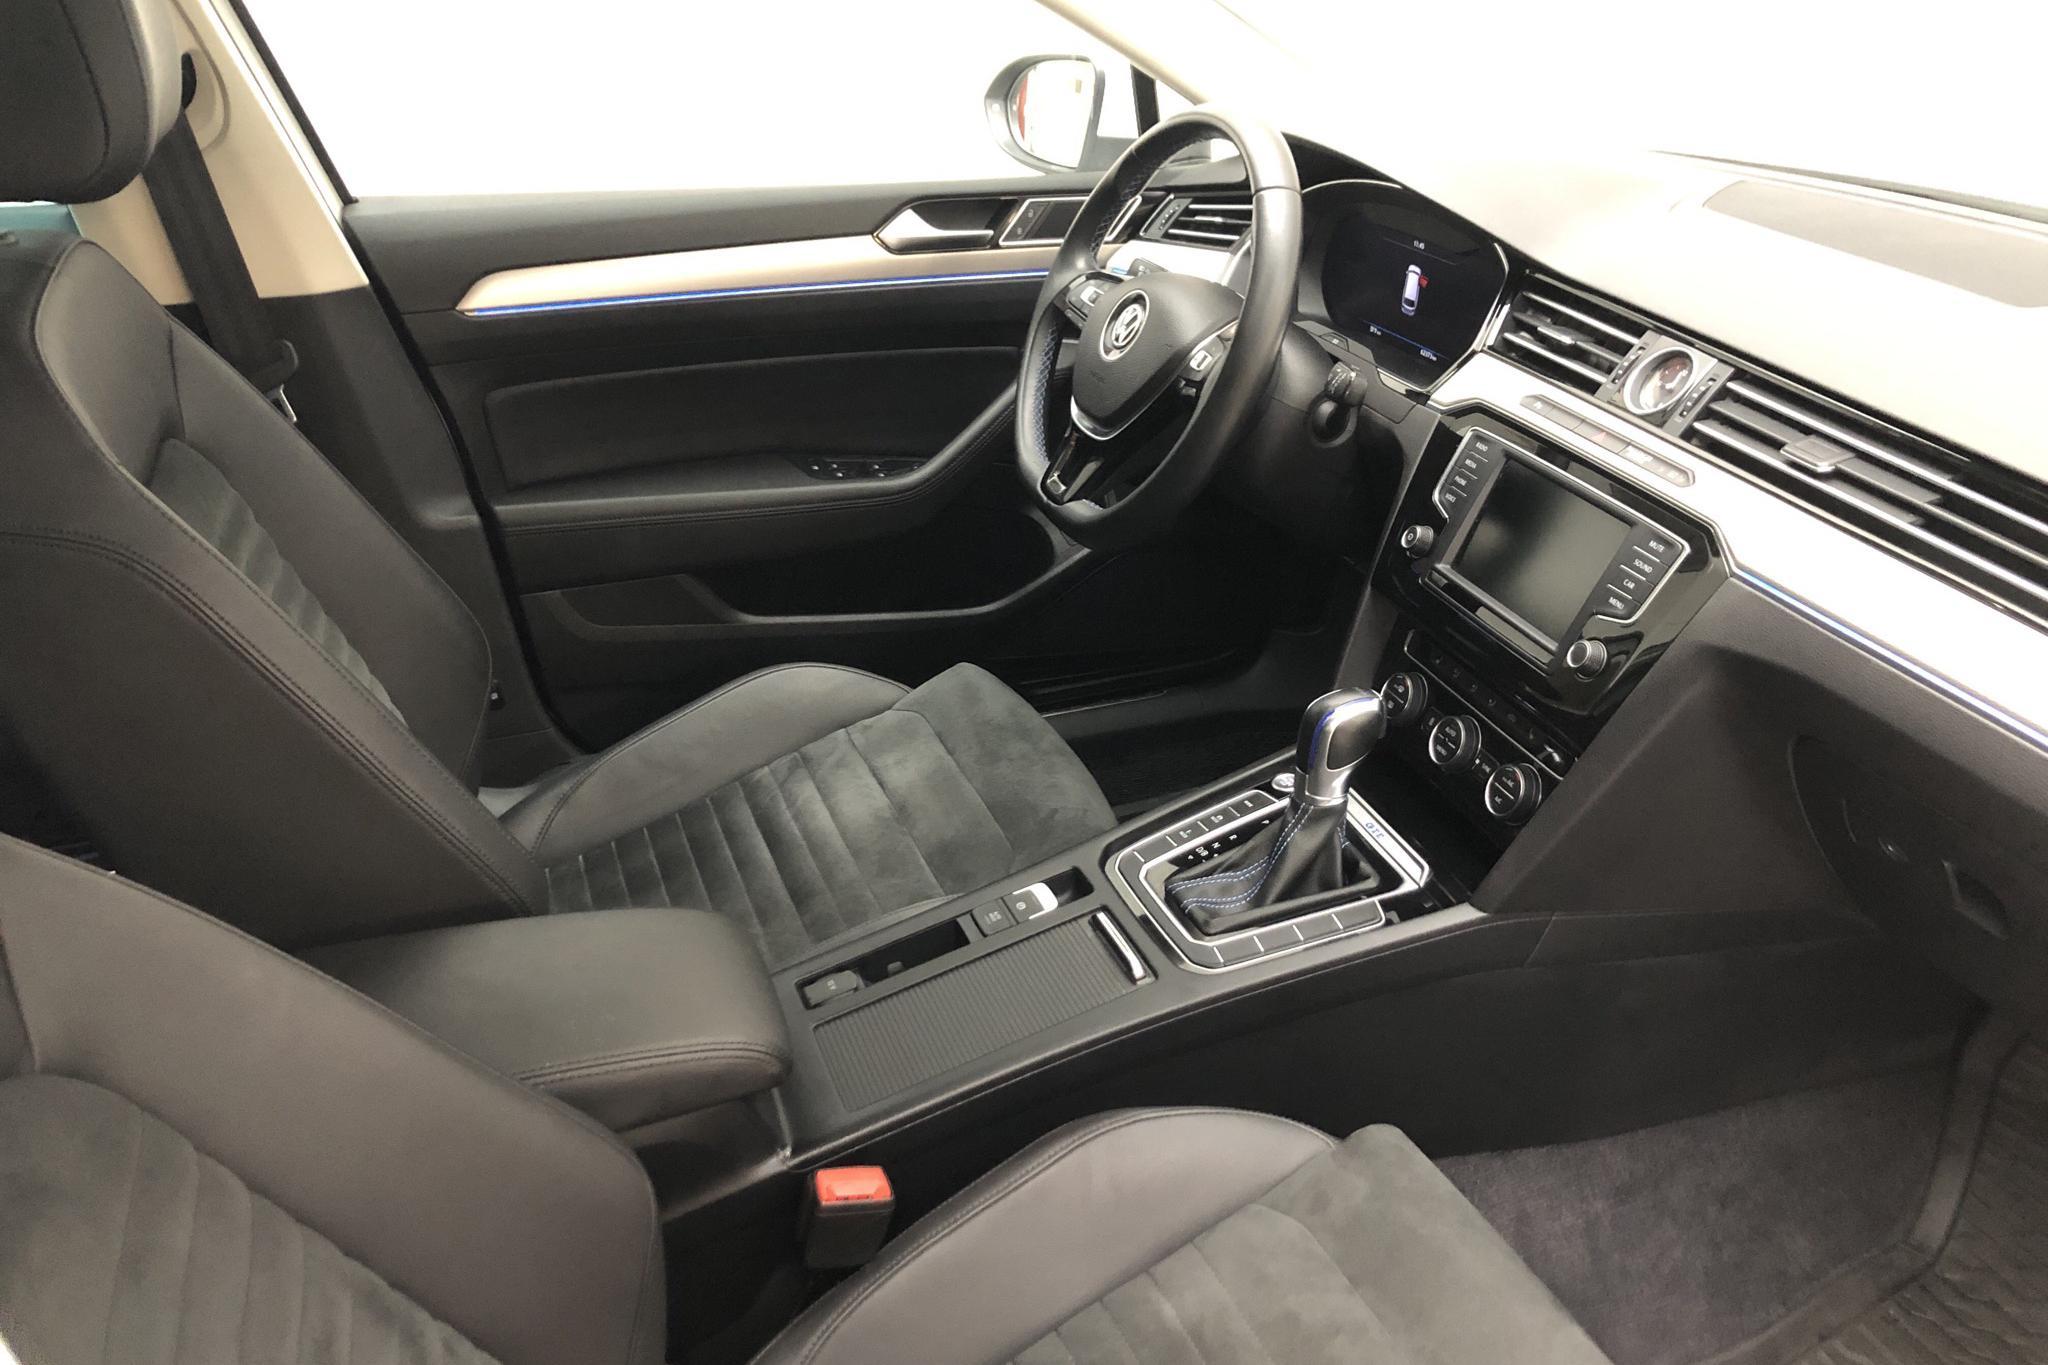 VW Passat 1.4 Plug-in-Hybrid Sportscombi (218hk) - 62 370 km - Automatic - white - 2017